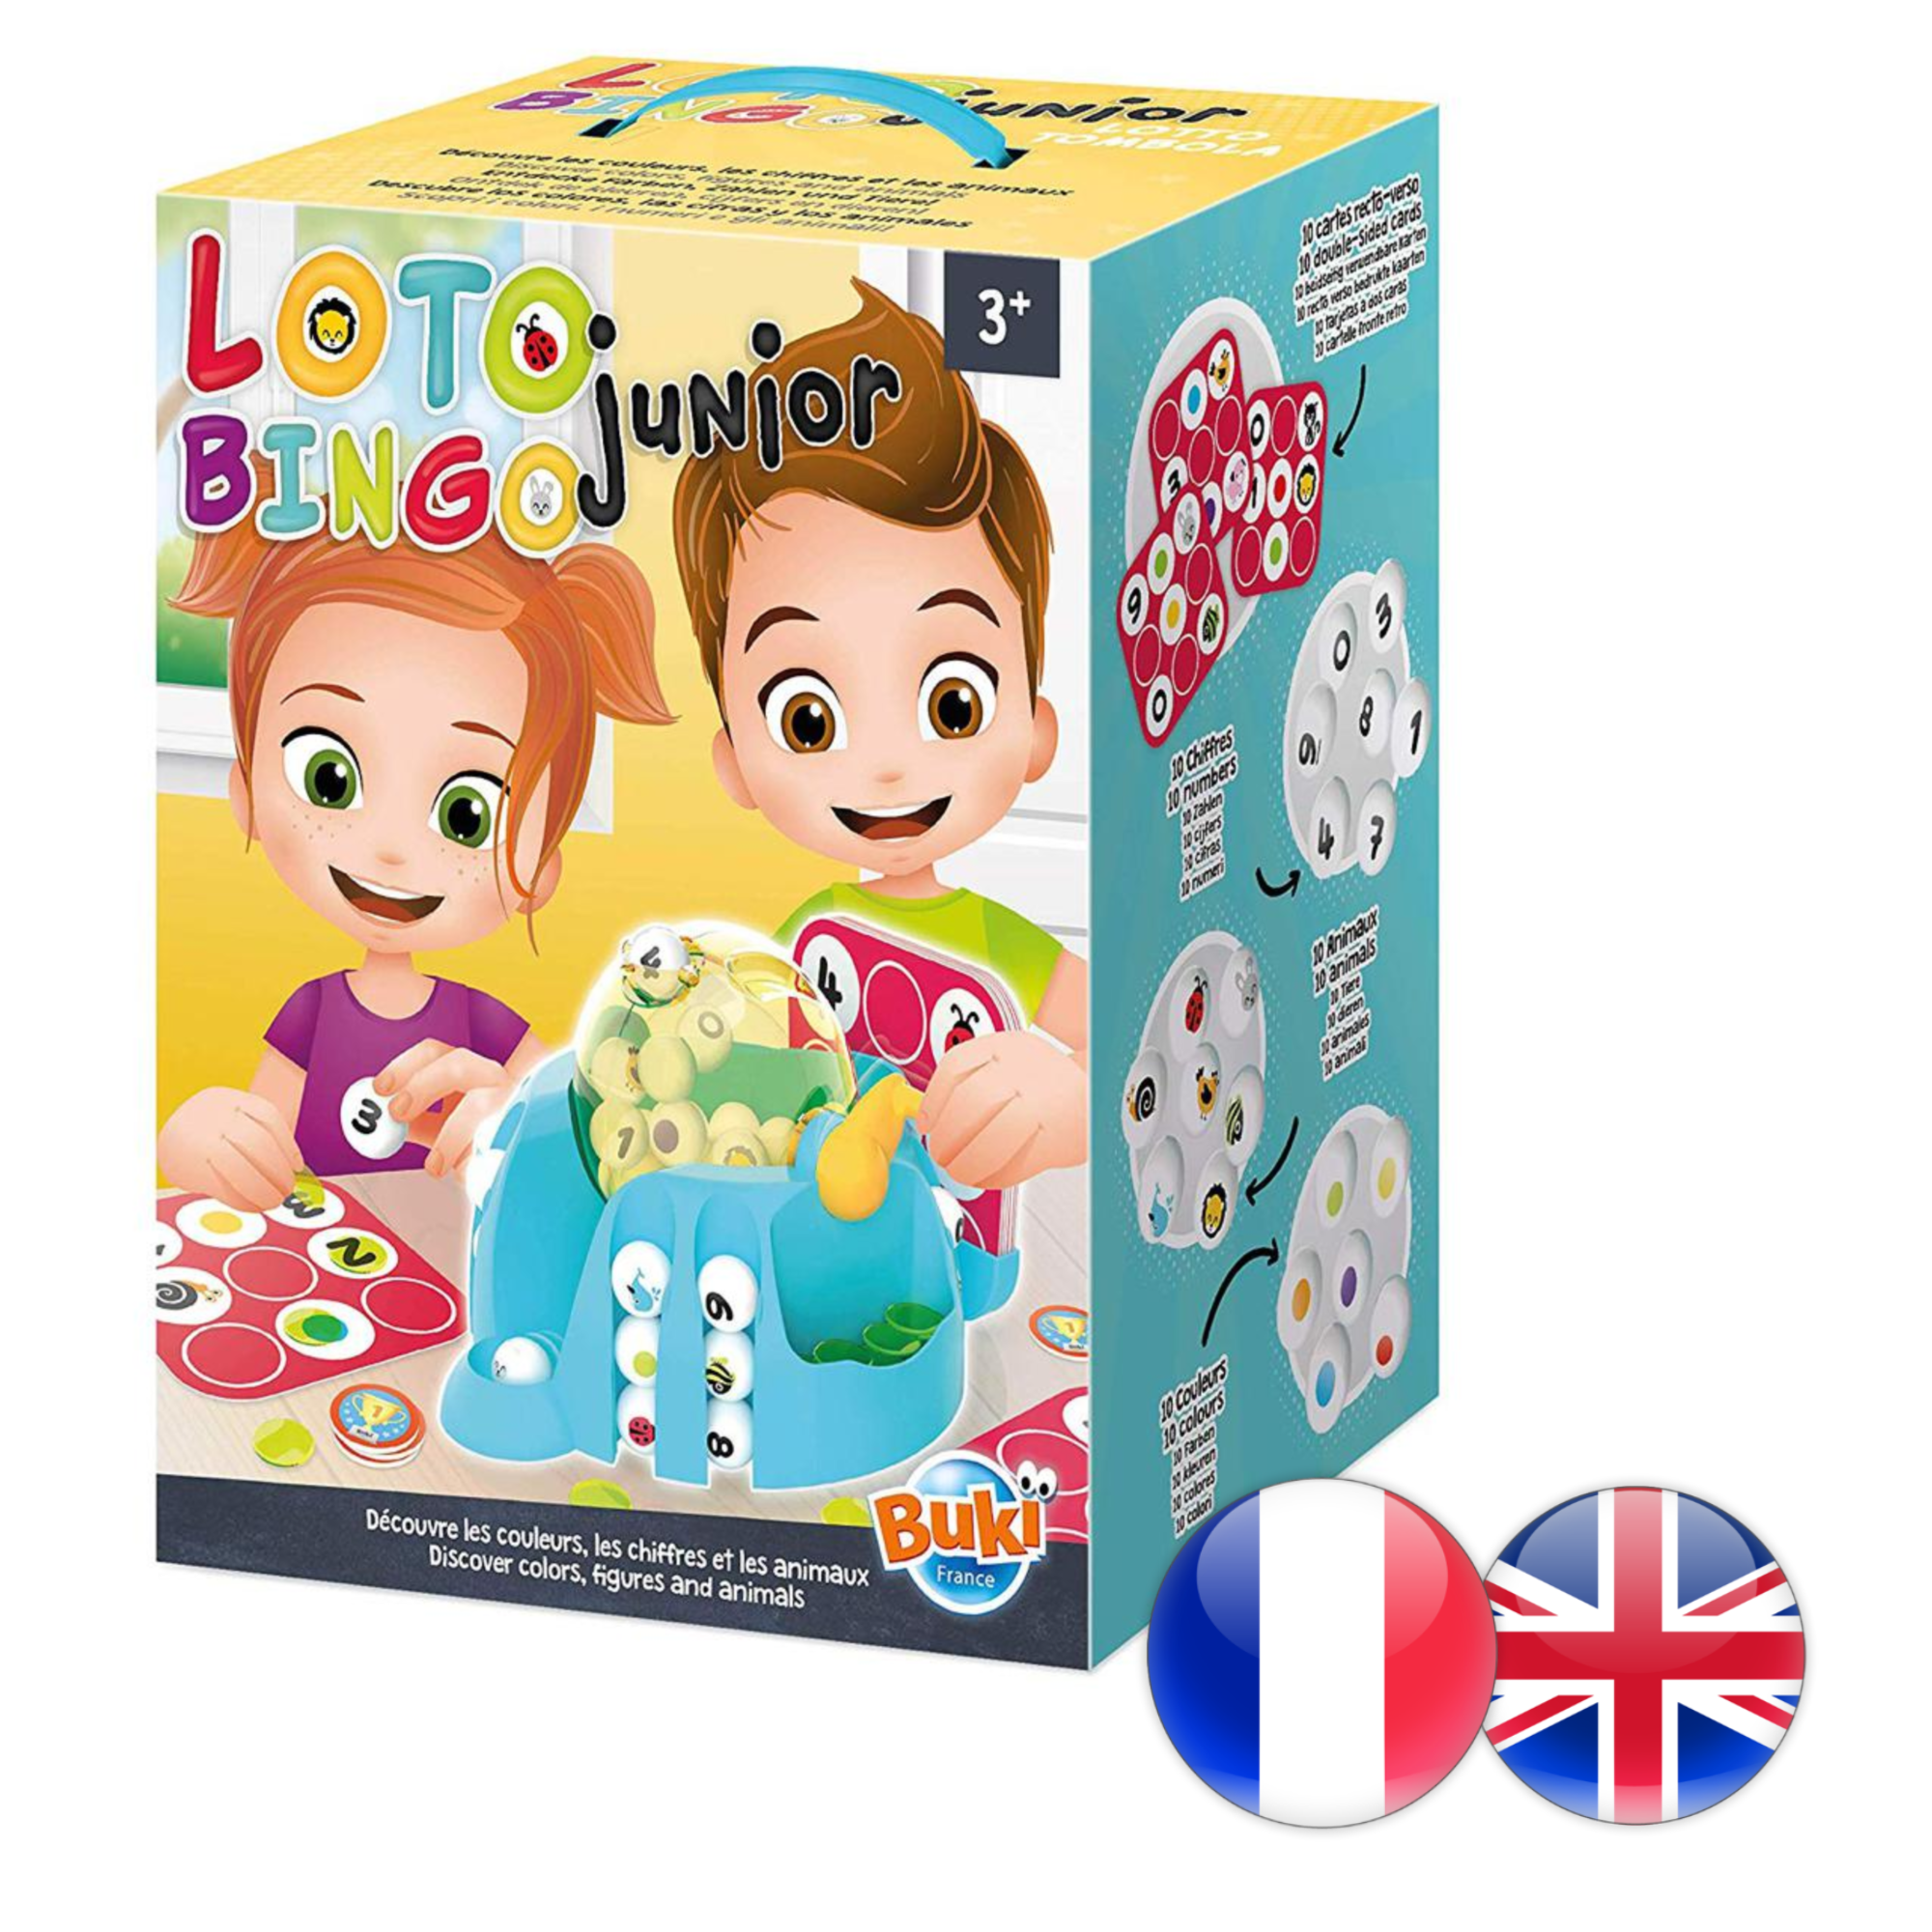 Buki Buki - Loto Bingo Junior